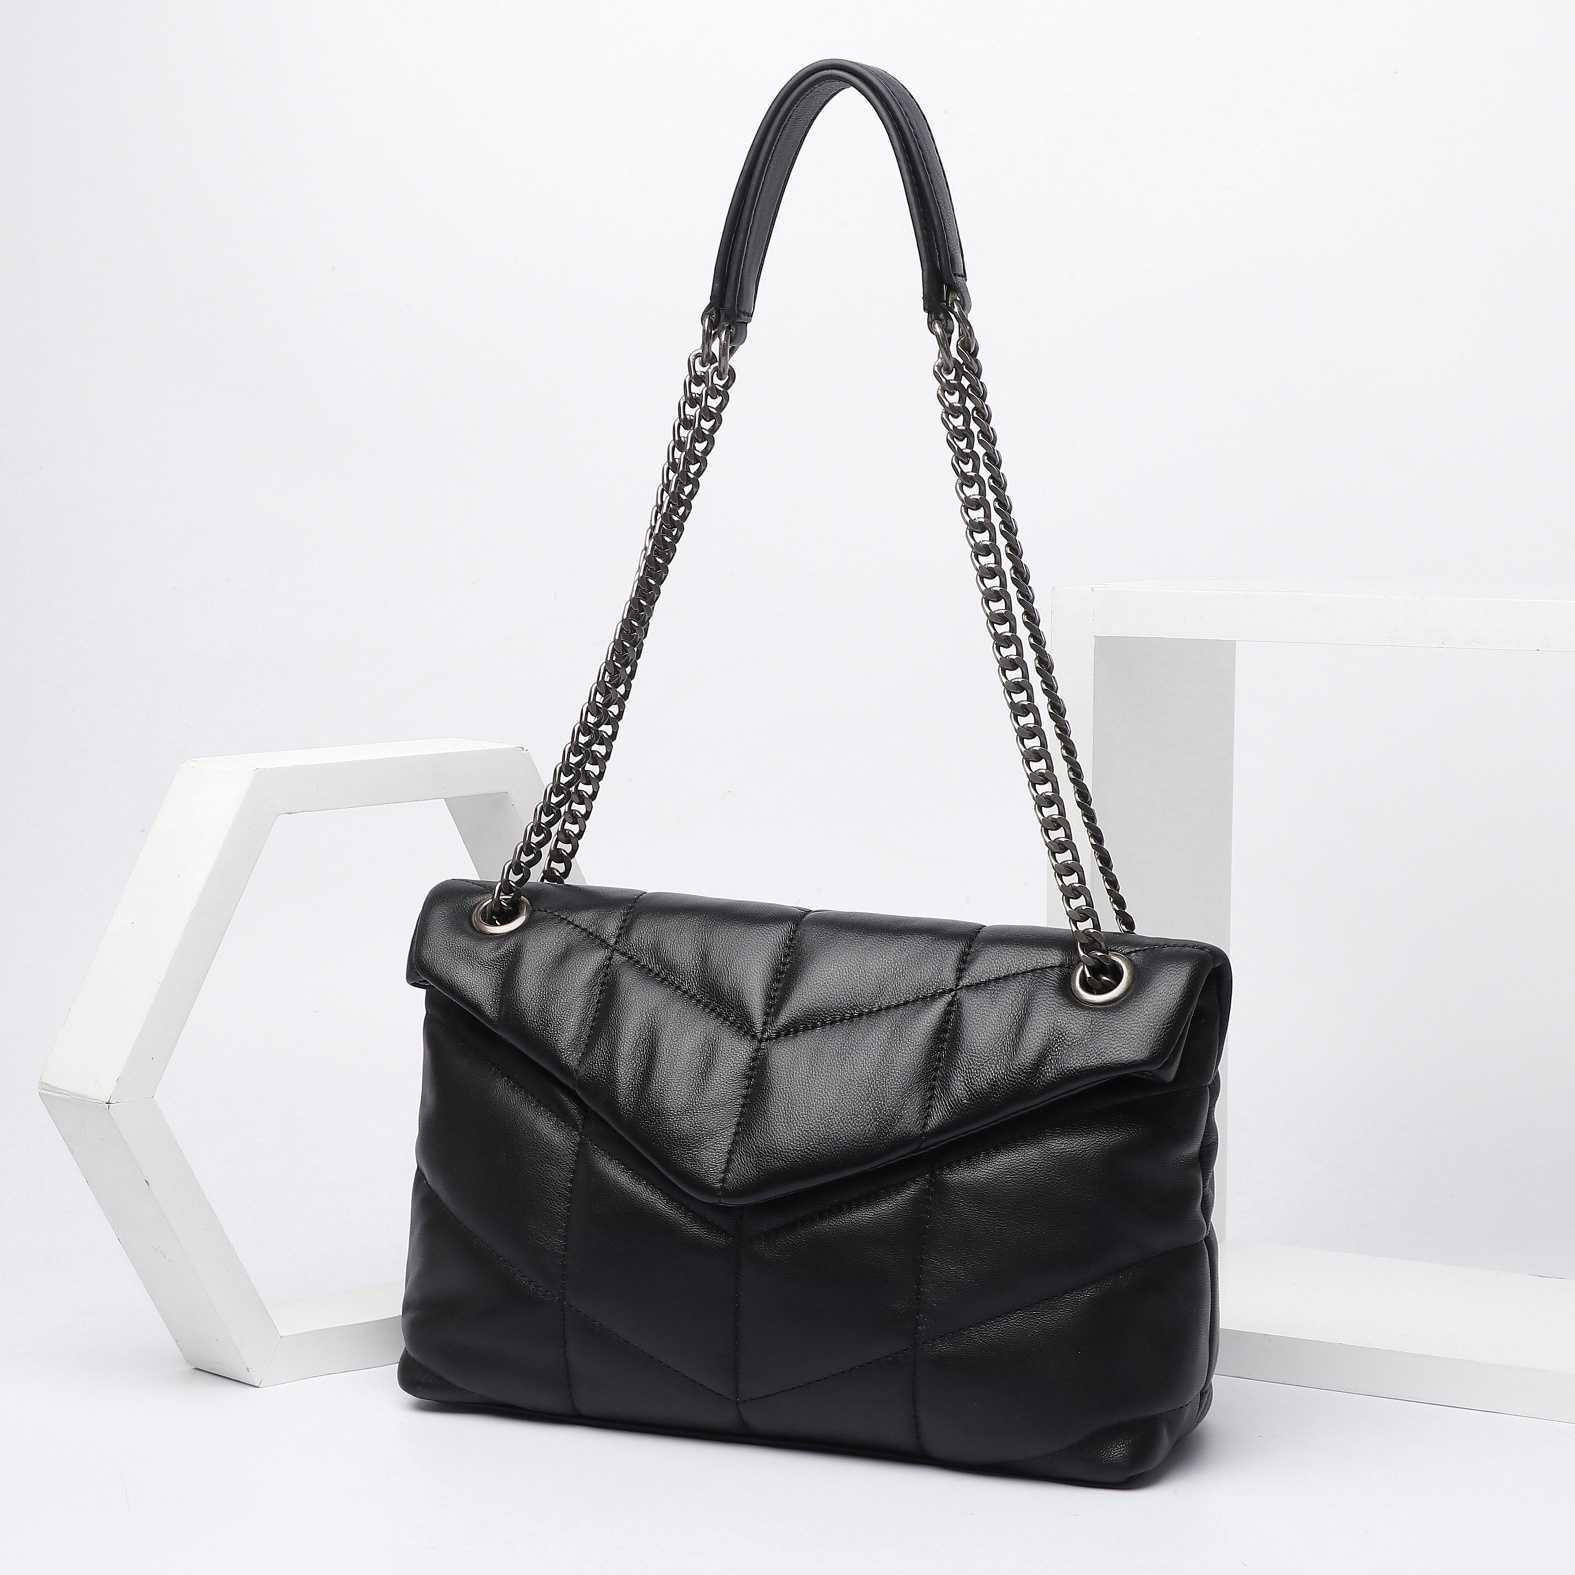 Designer luxury handbags purses womens luxury designer bag handbags main designer shoulder messenger bag men crossbody bags purse